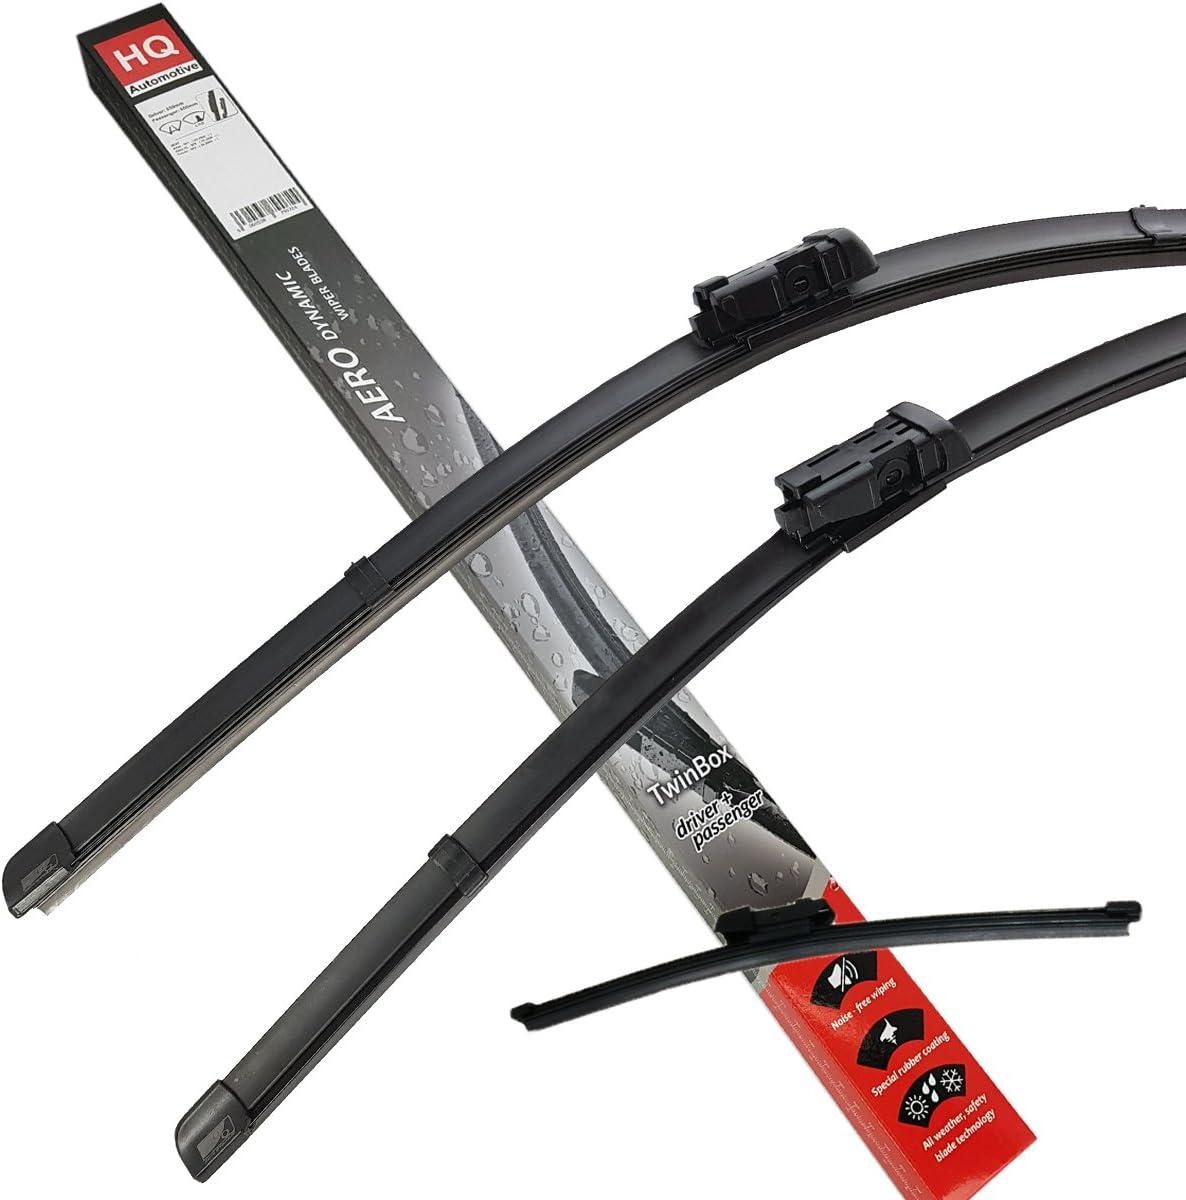 2 x Blades MINI Hatchback Sep 2013 Onwards Windscreen Wiper Blade Kit